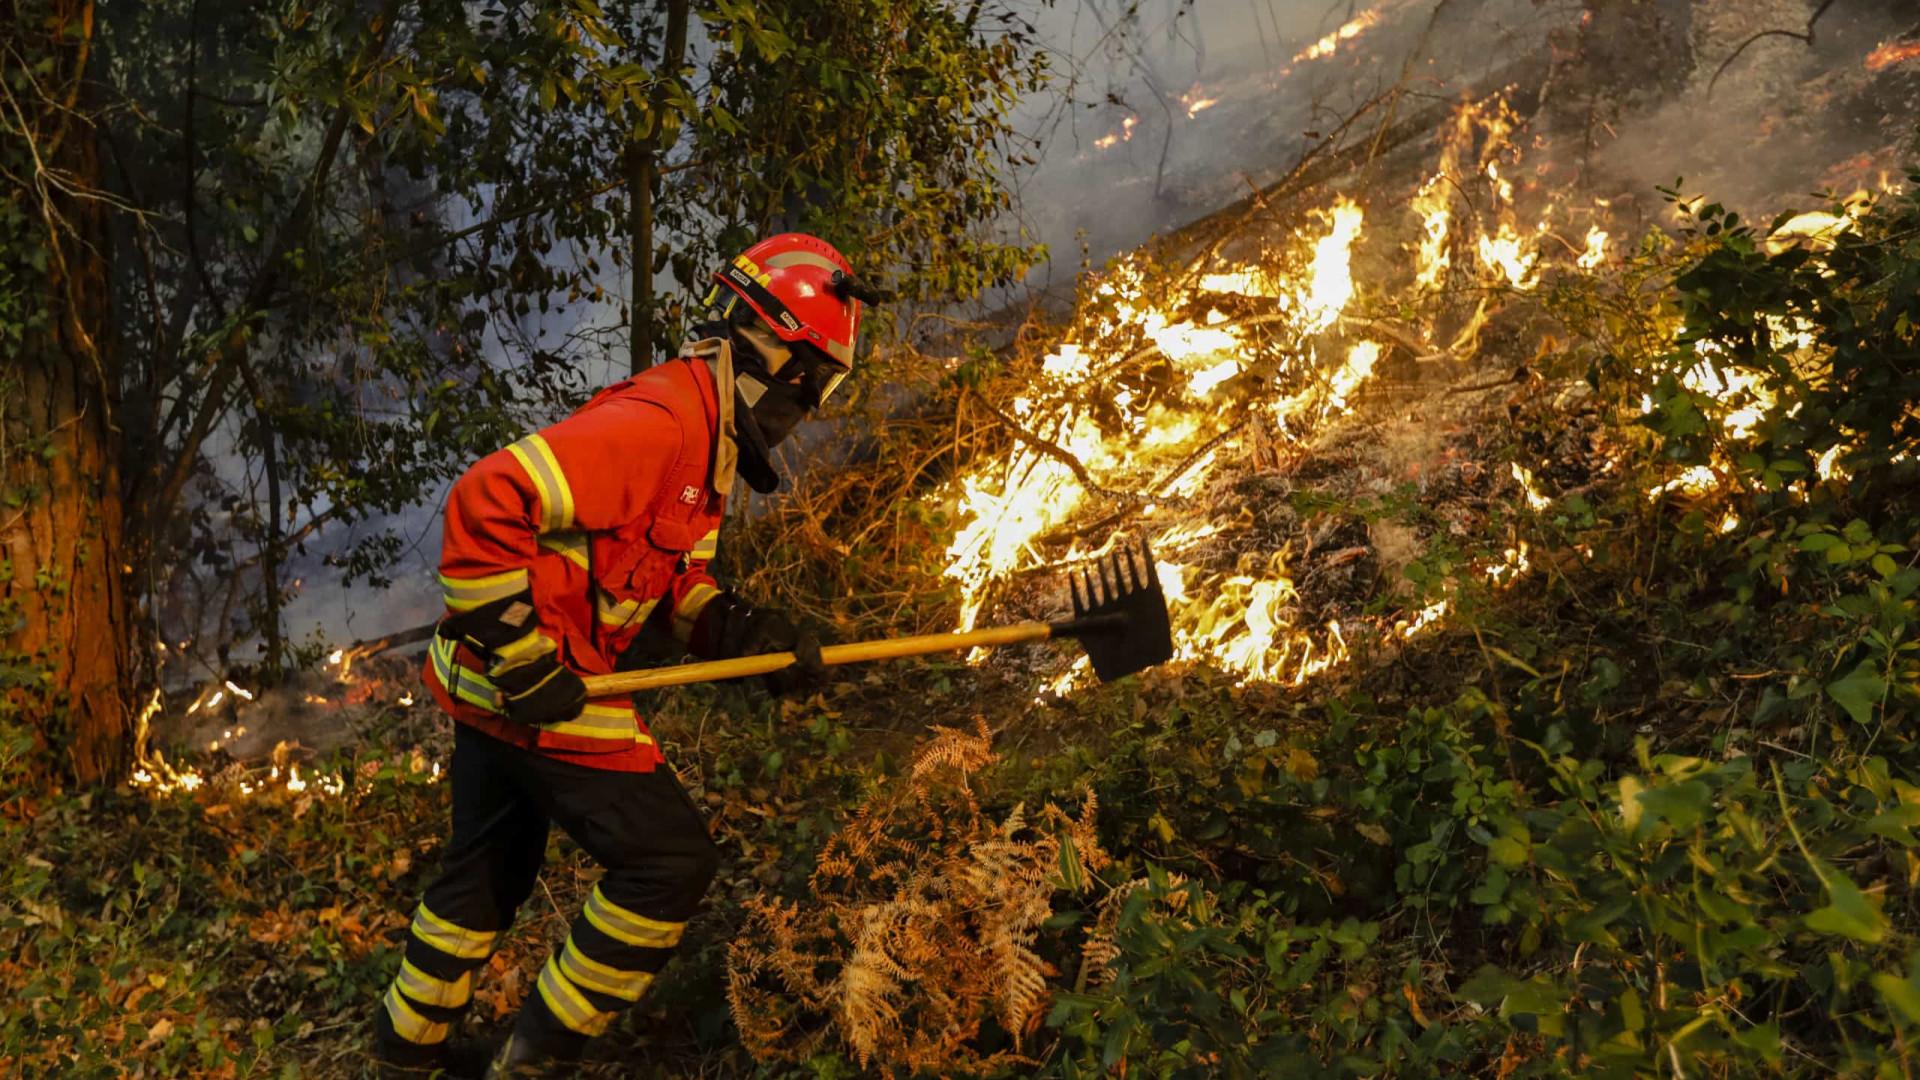 Portugal: 268 focos de incêndio registrados no sábado